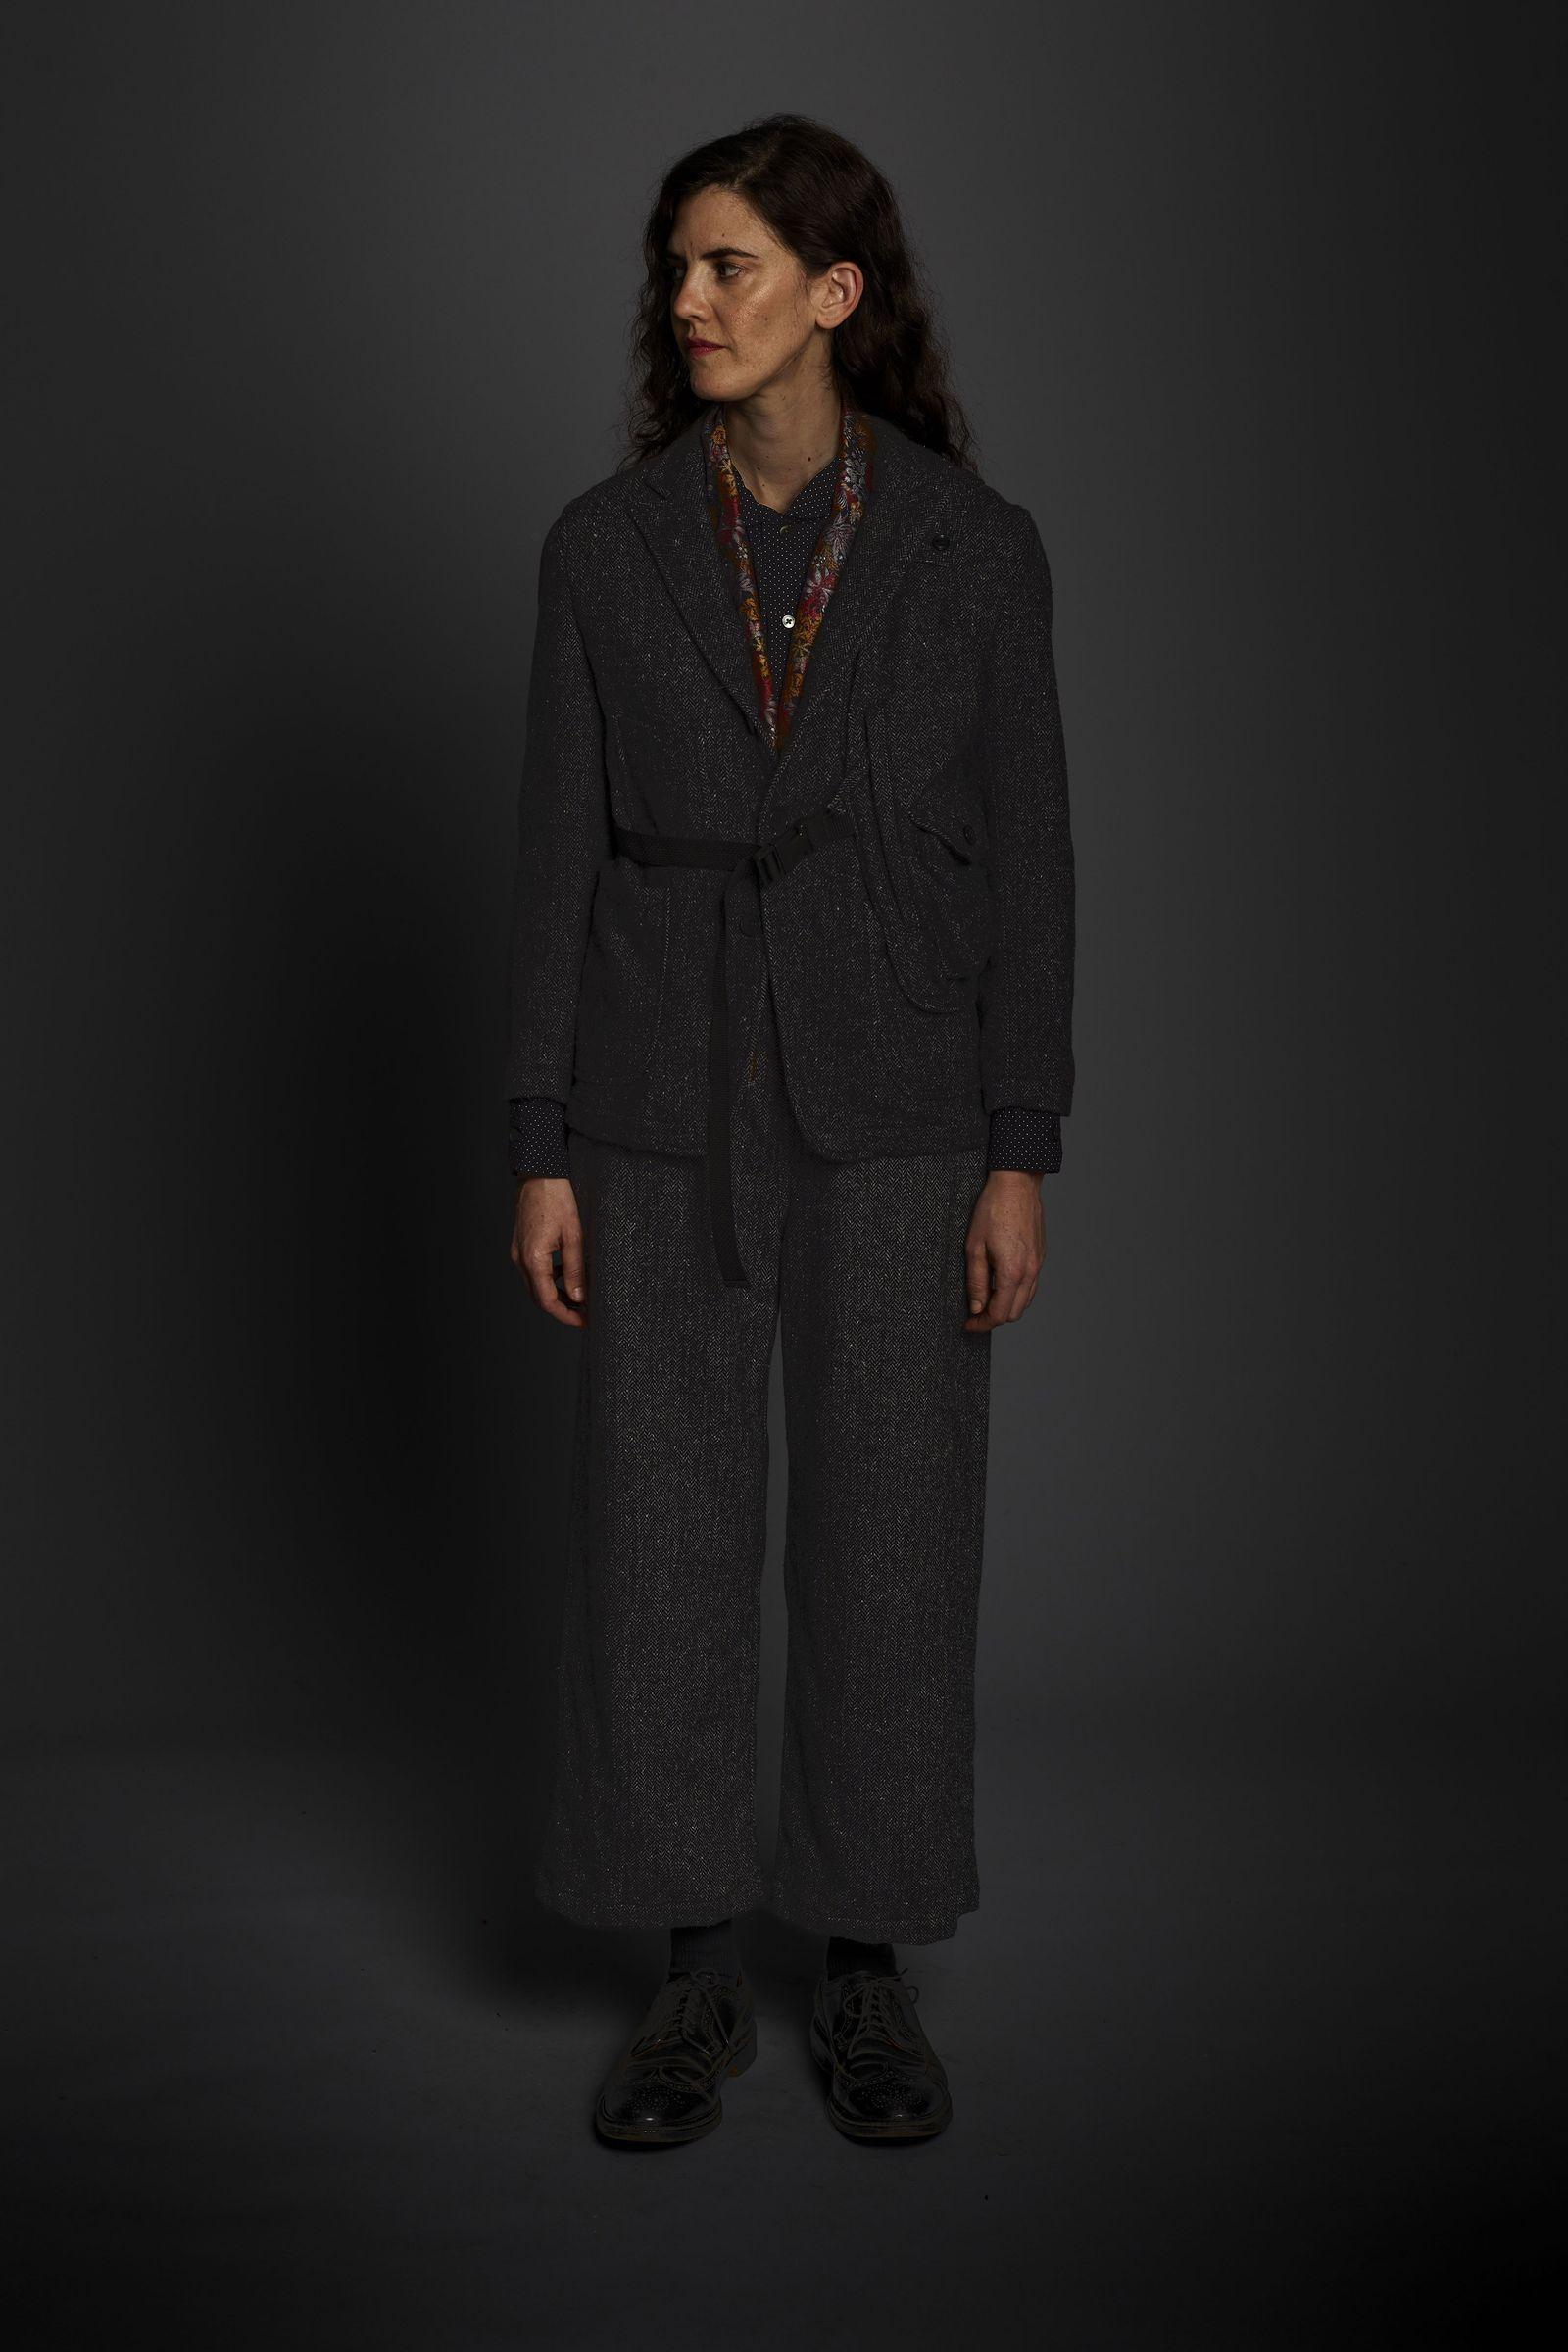 engineered-garments-fall-winter-2020-25